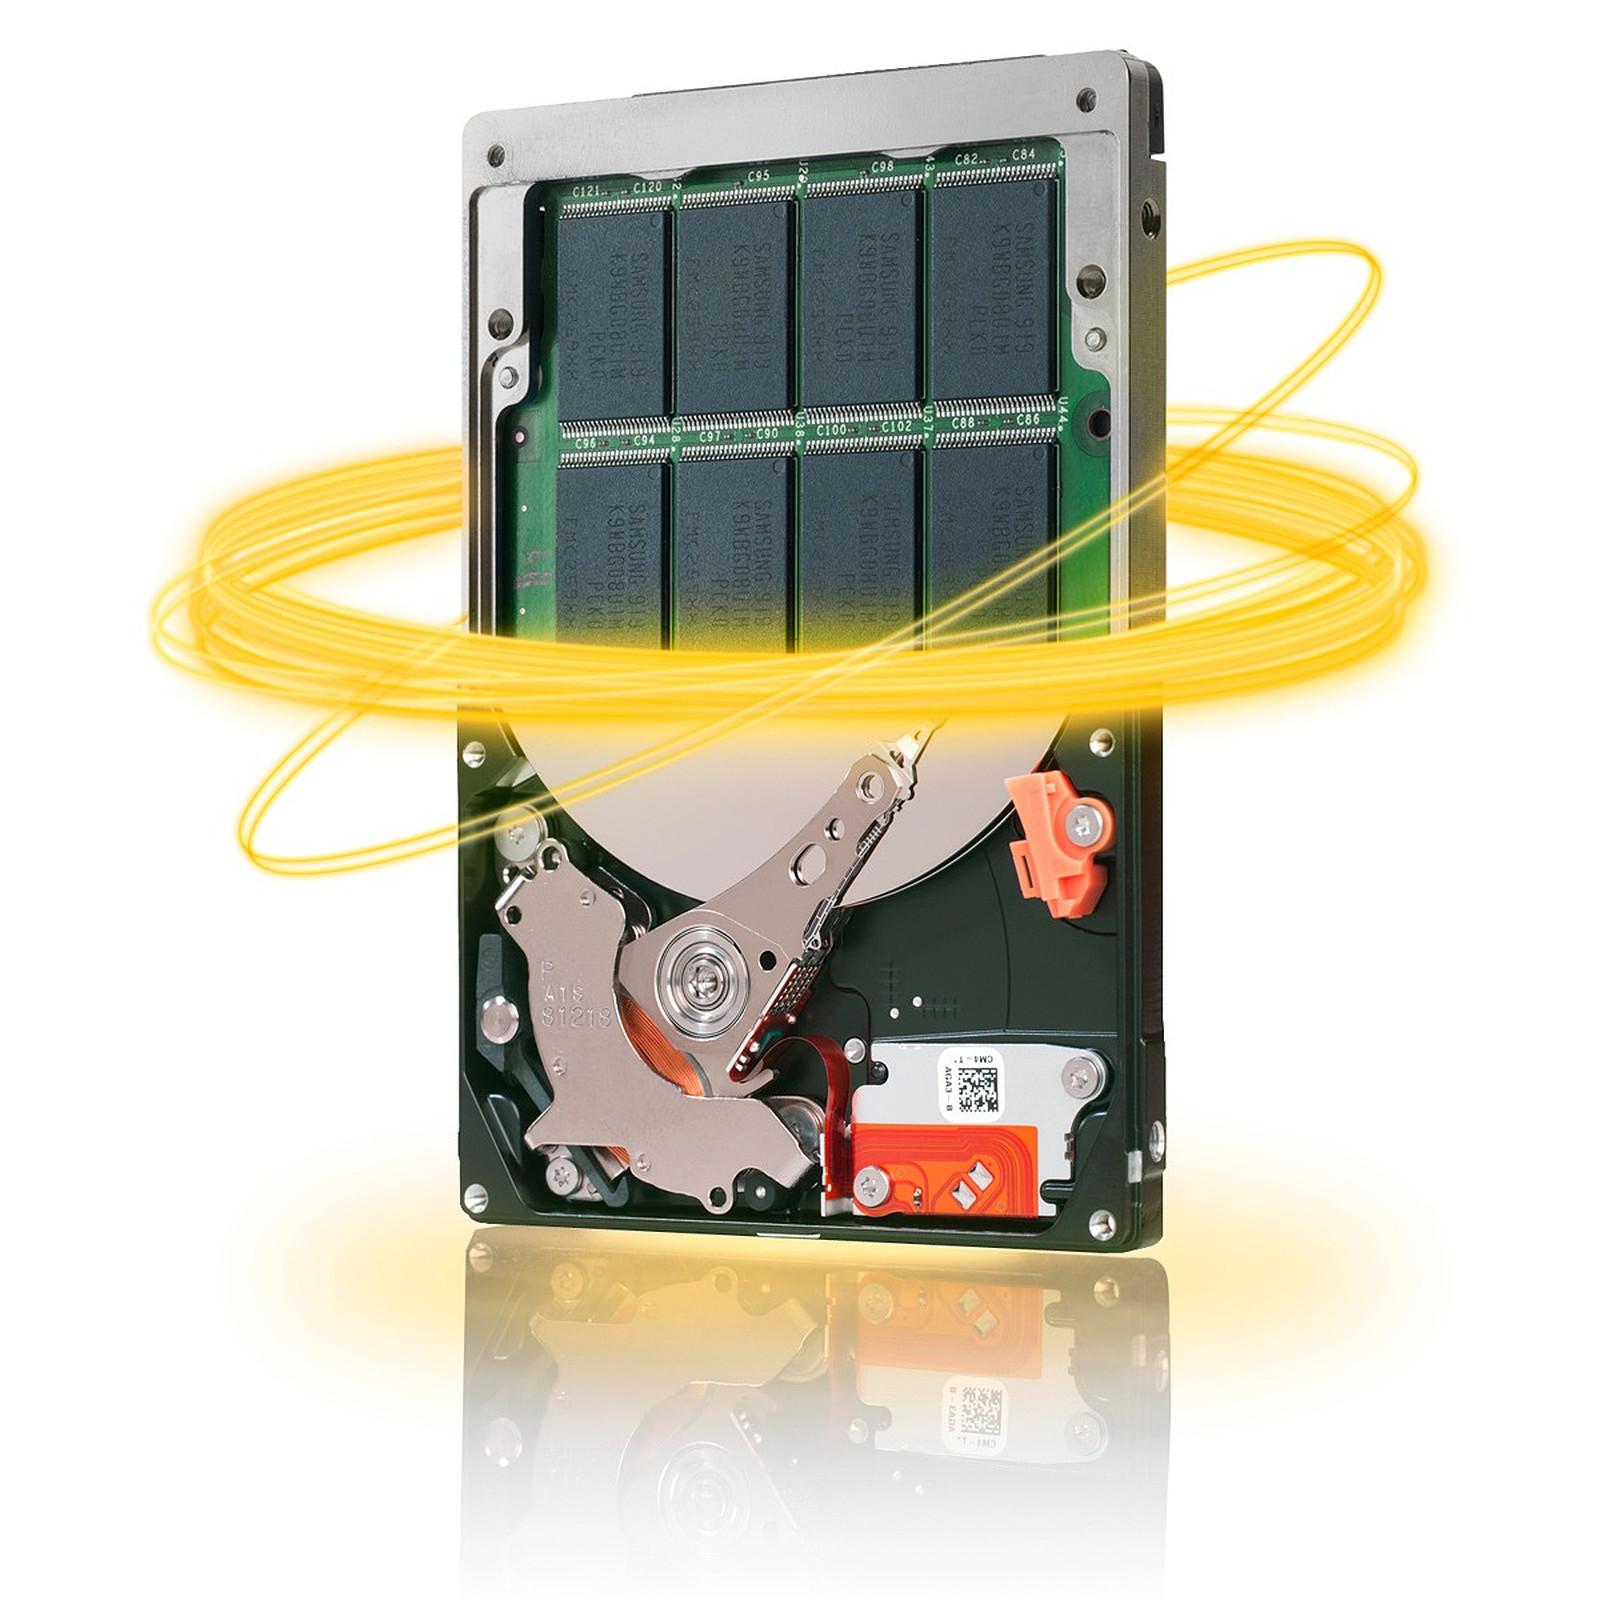 Seagate Momentus XT 7200.1 Hybrid SSD 500 GB NAND Flash SLC 4 GB